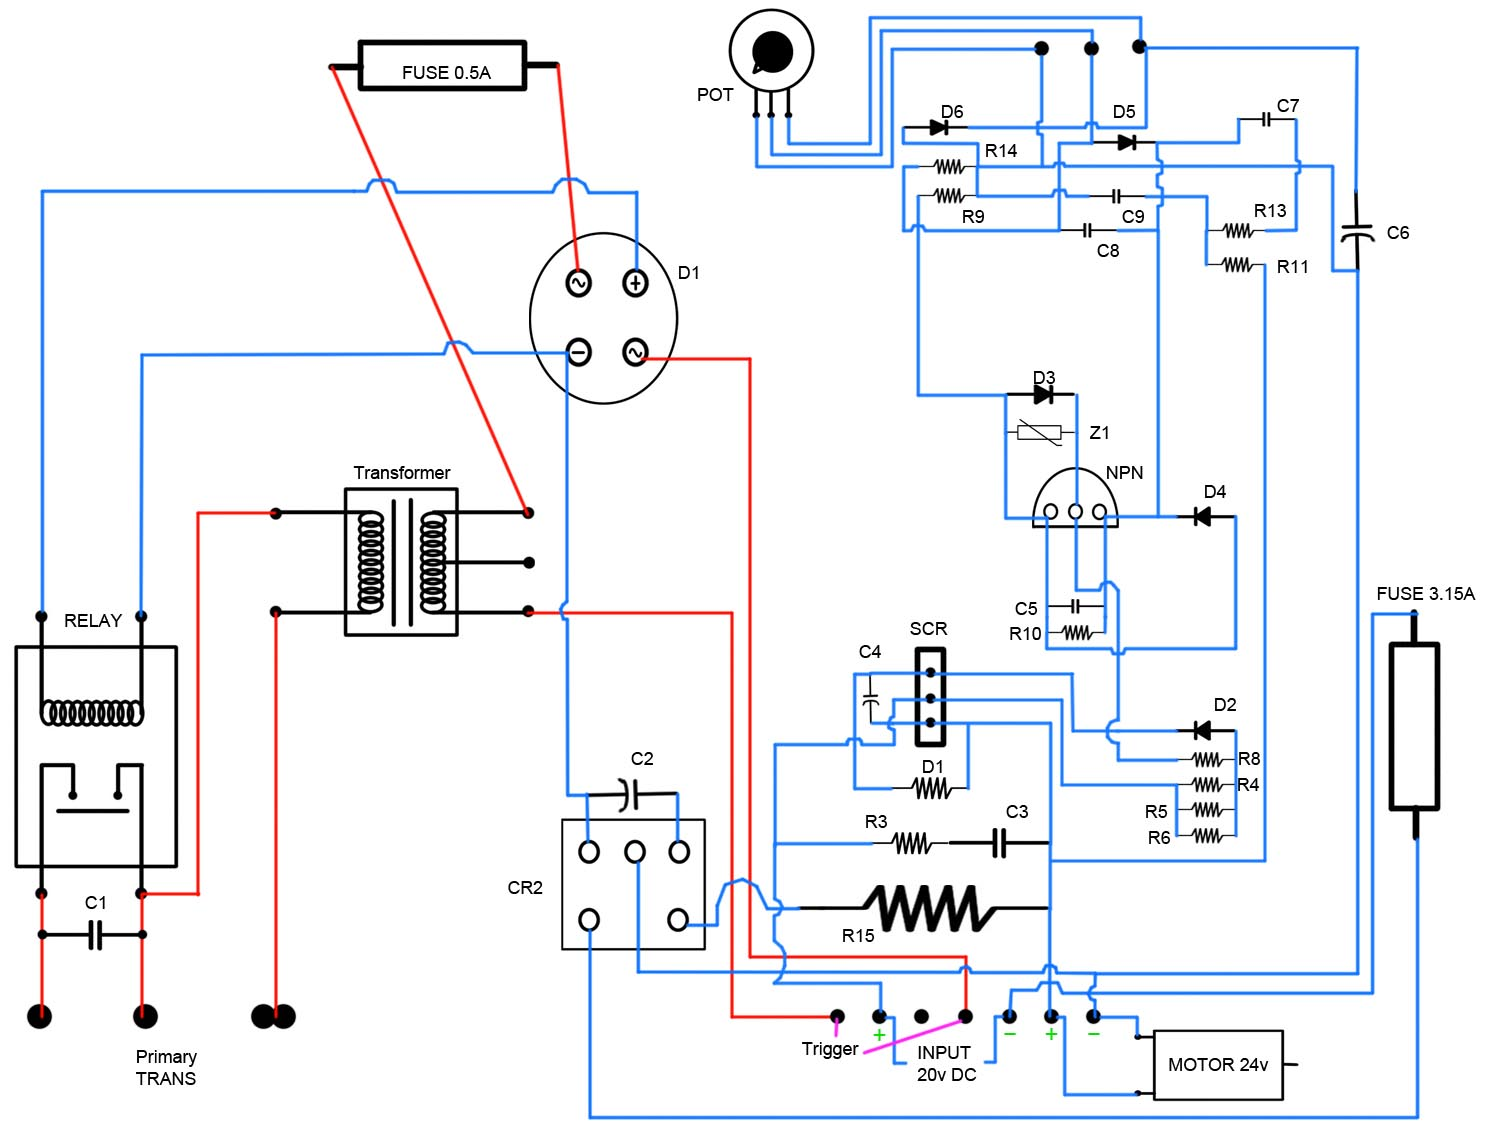 Welding Transformer Wiring Diagram Auto Electrical Cp90 Whelen Strobe Wire Tech Stuff Mig 120amp Pcb Schematic